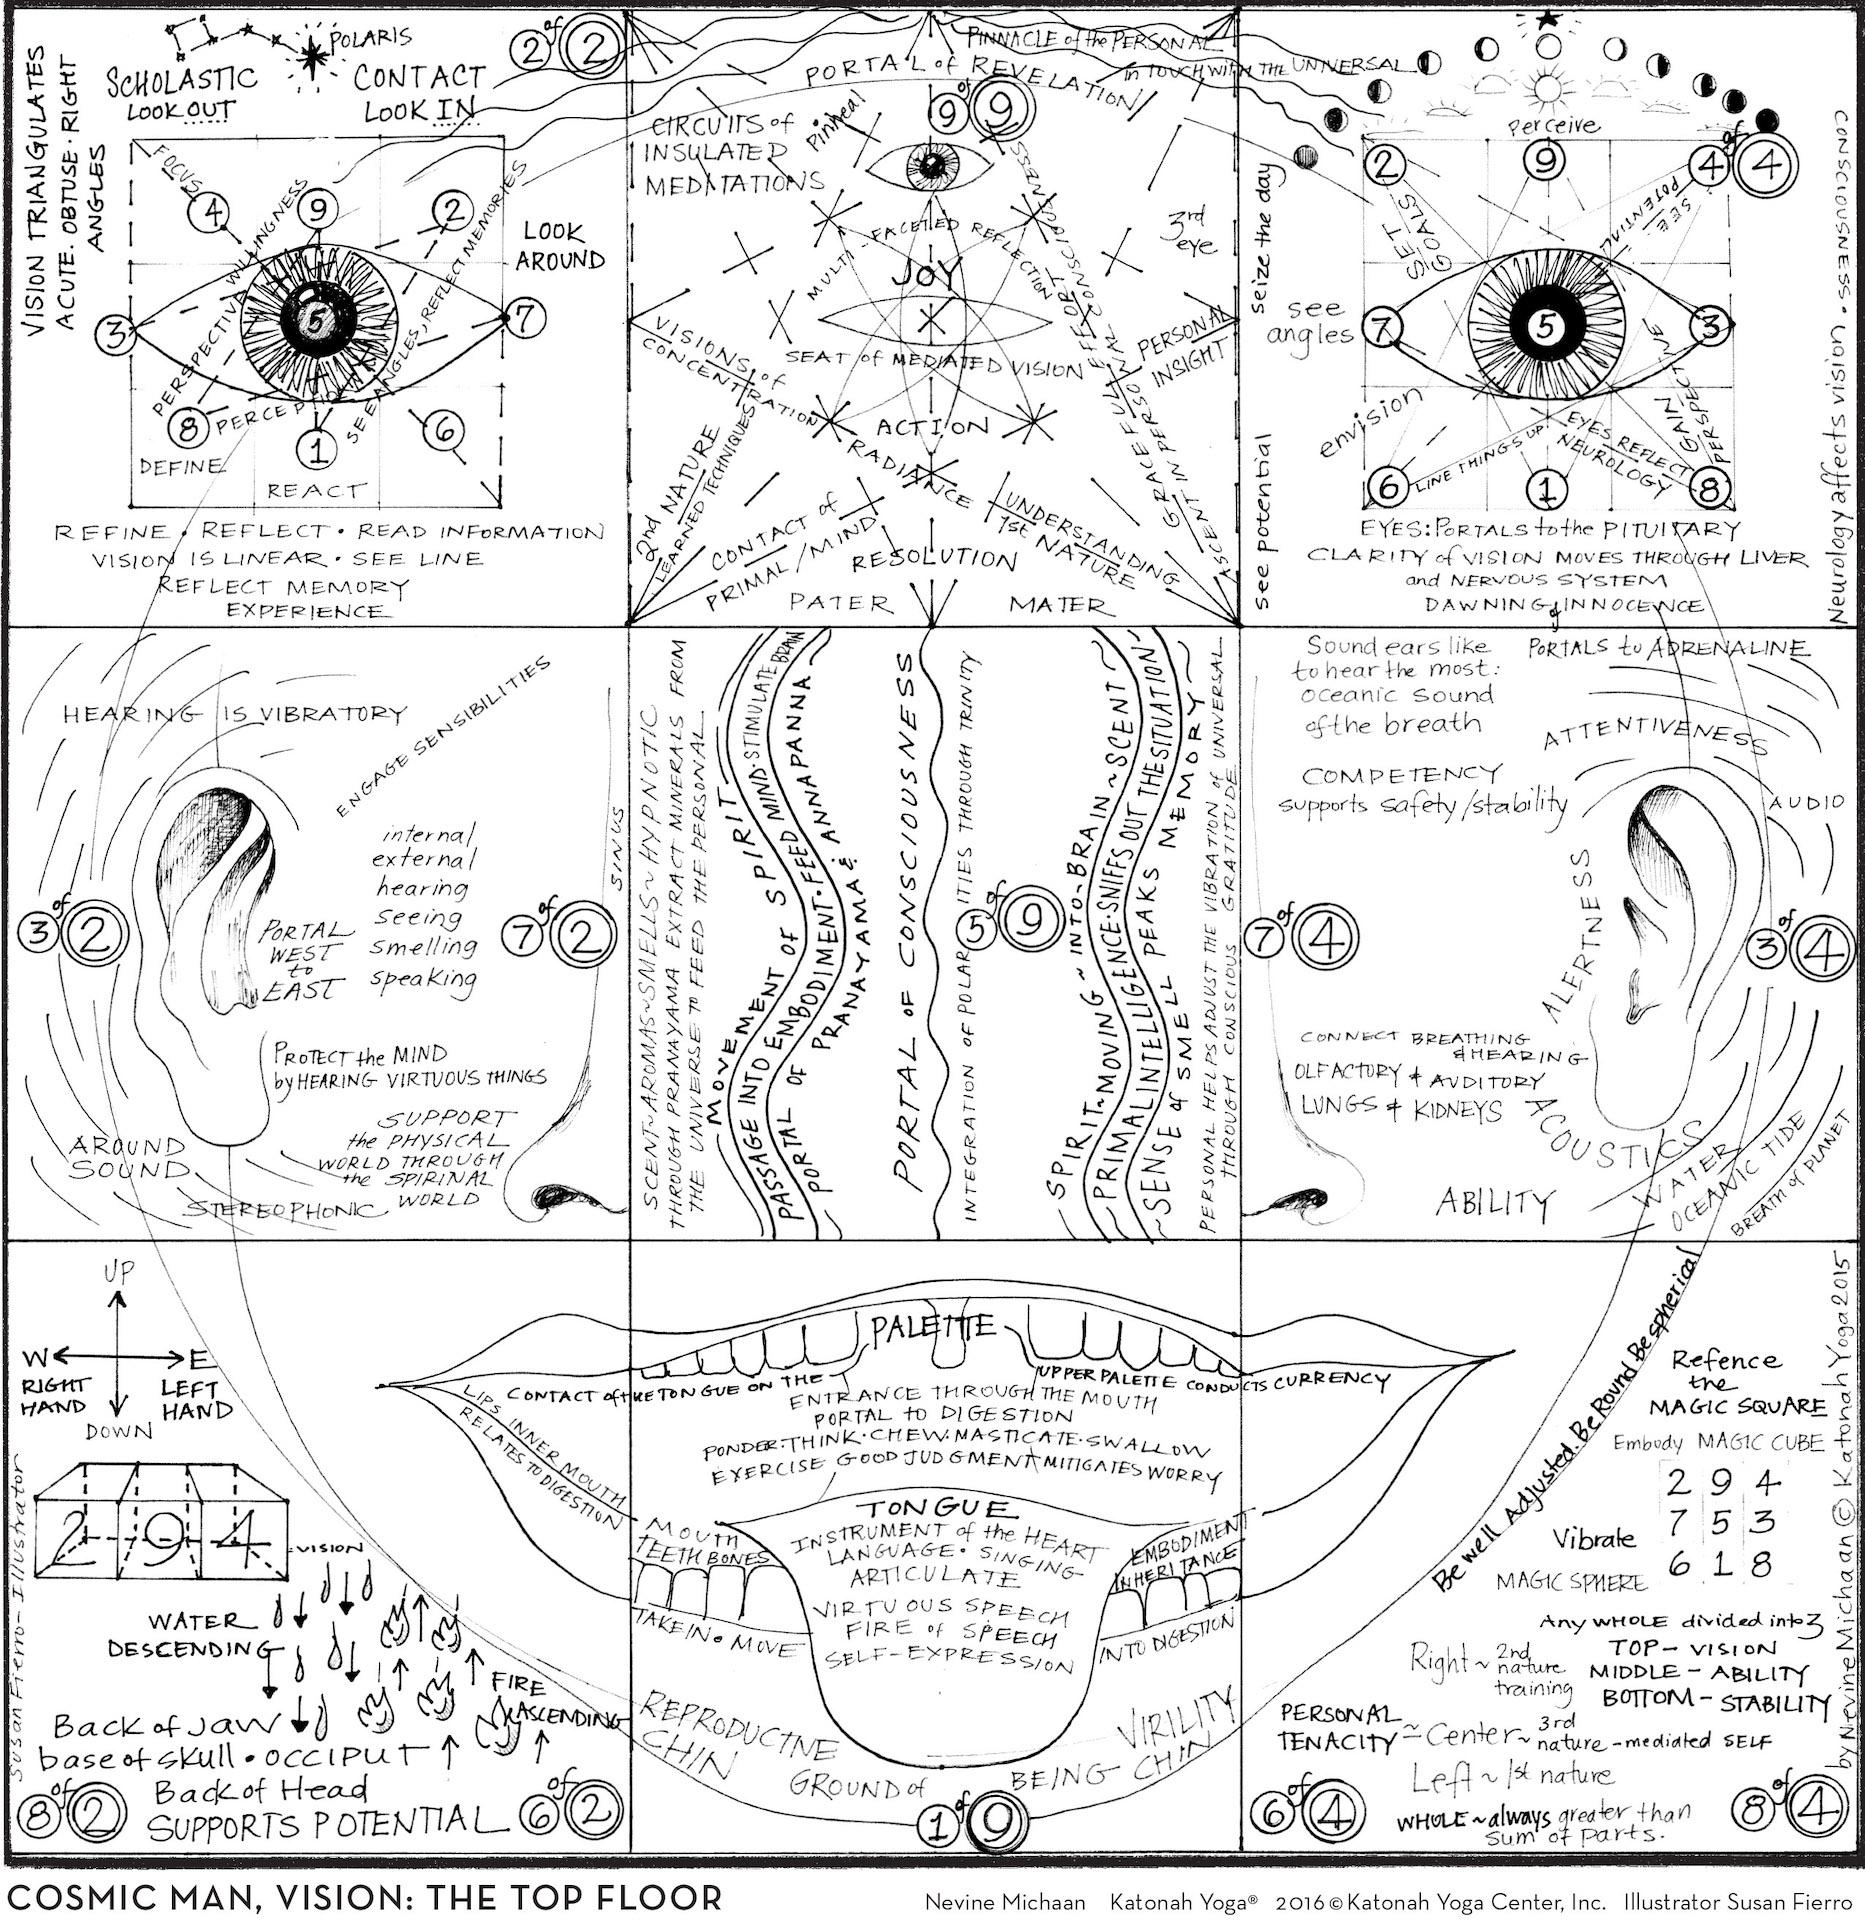 BODY AS ARCHETYPE MAPS